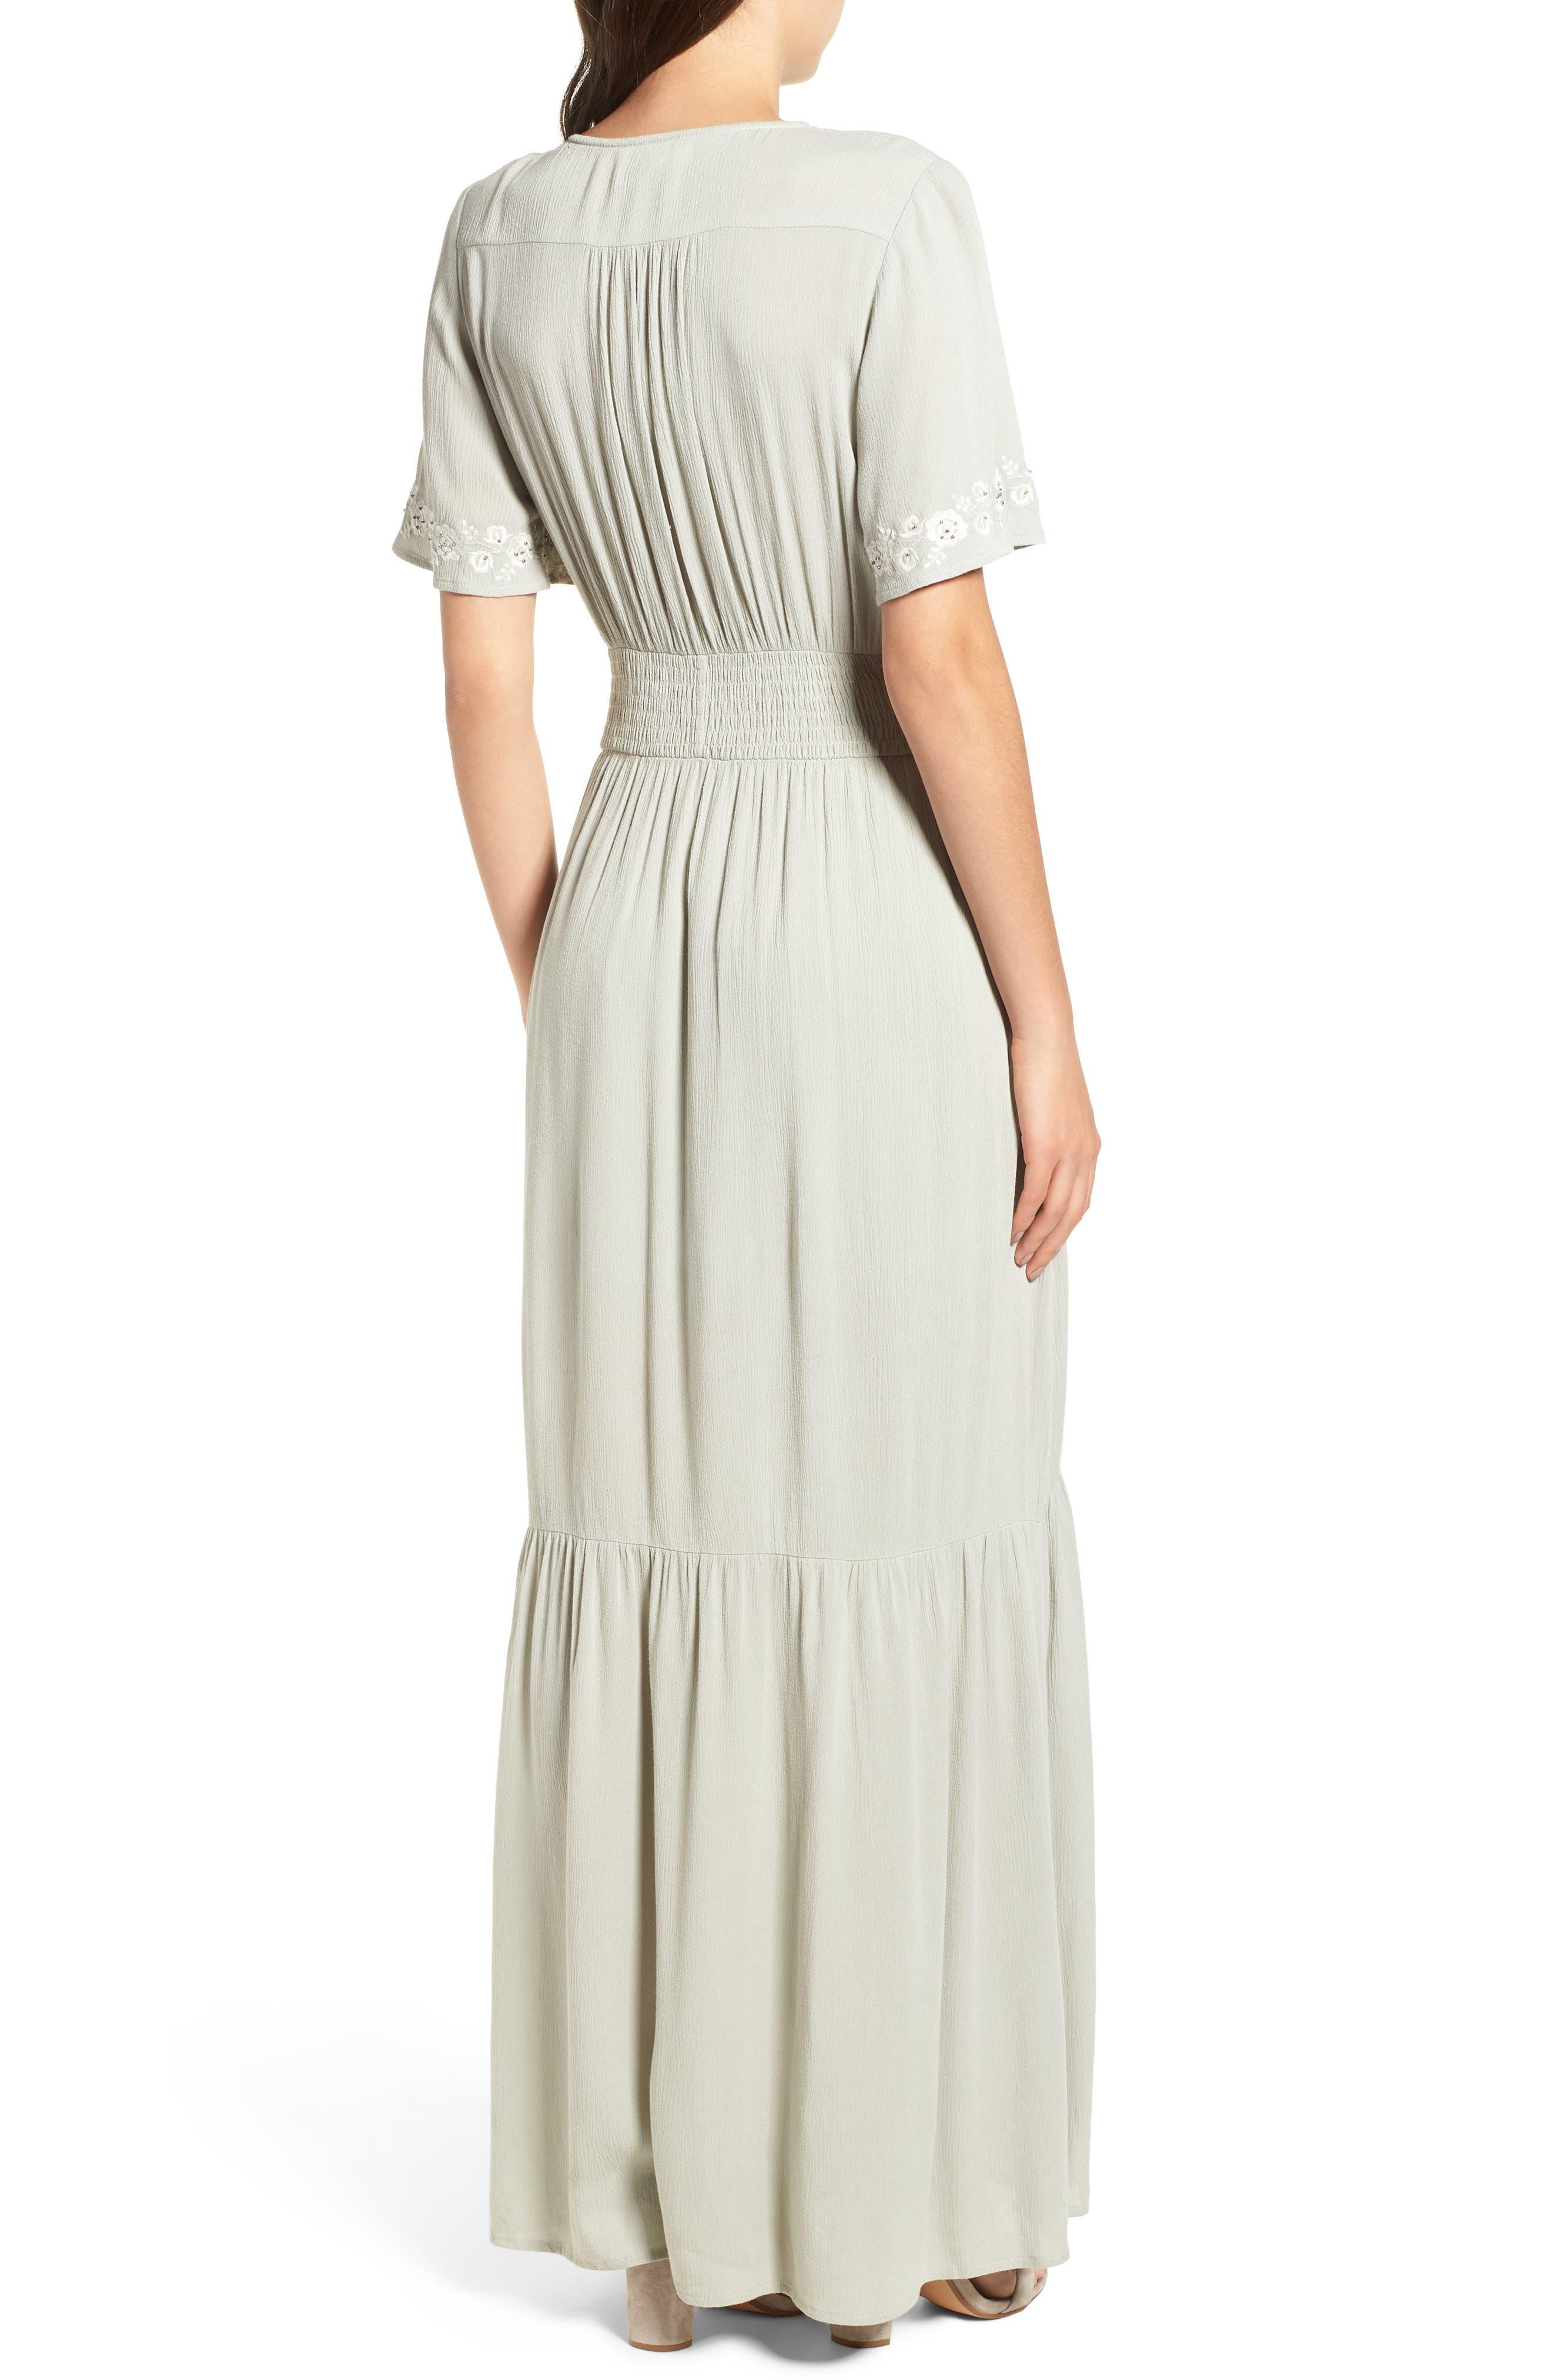 Athena Embroidered Maxi Dress,                             Alternate thumbnail 2, color,